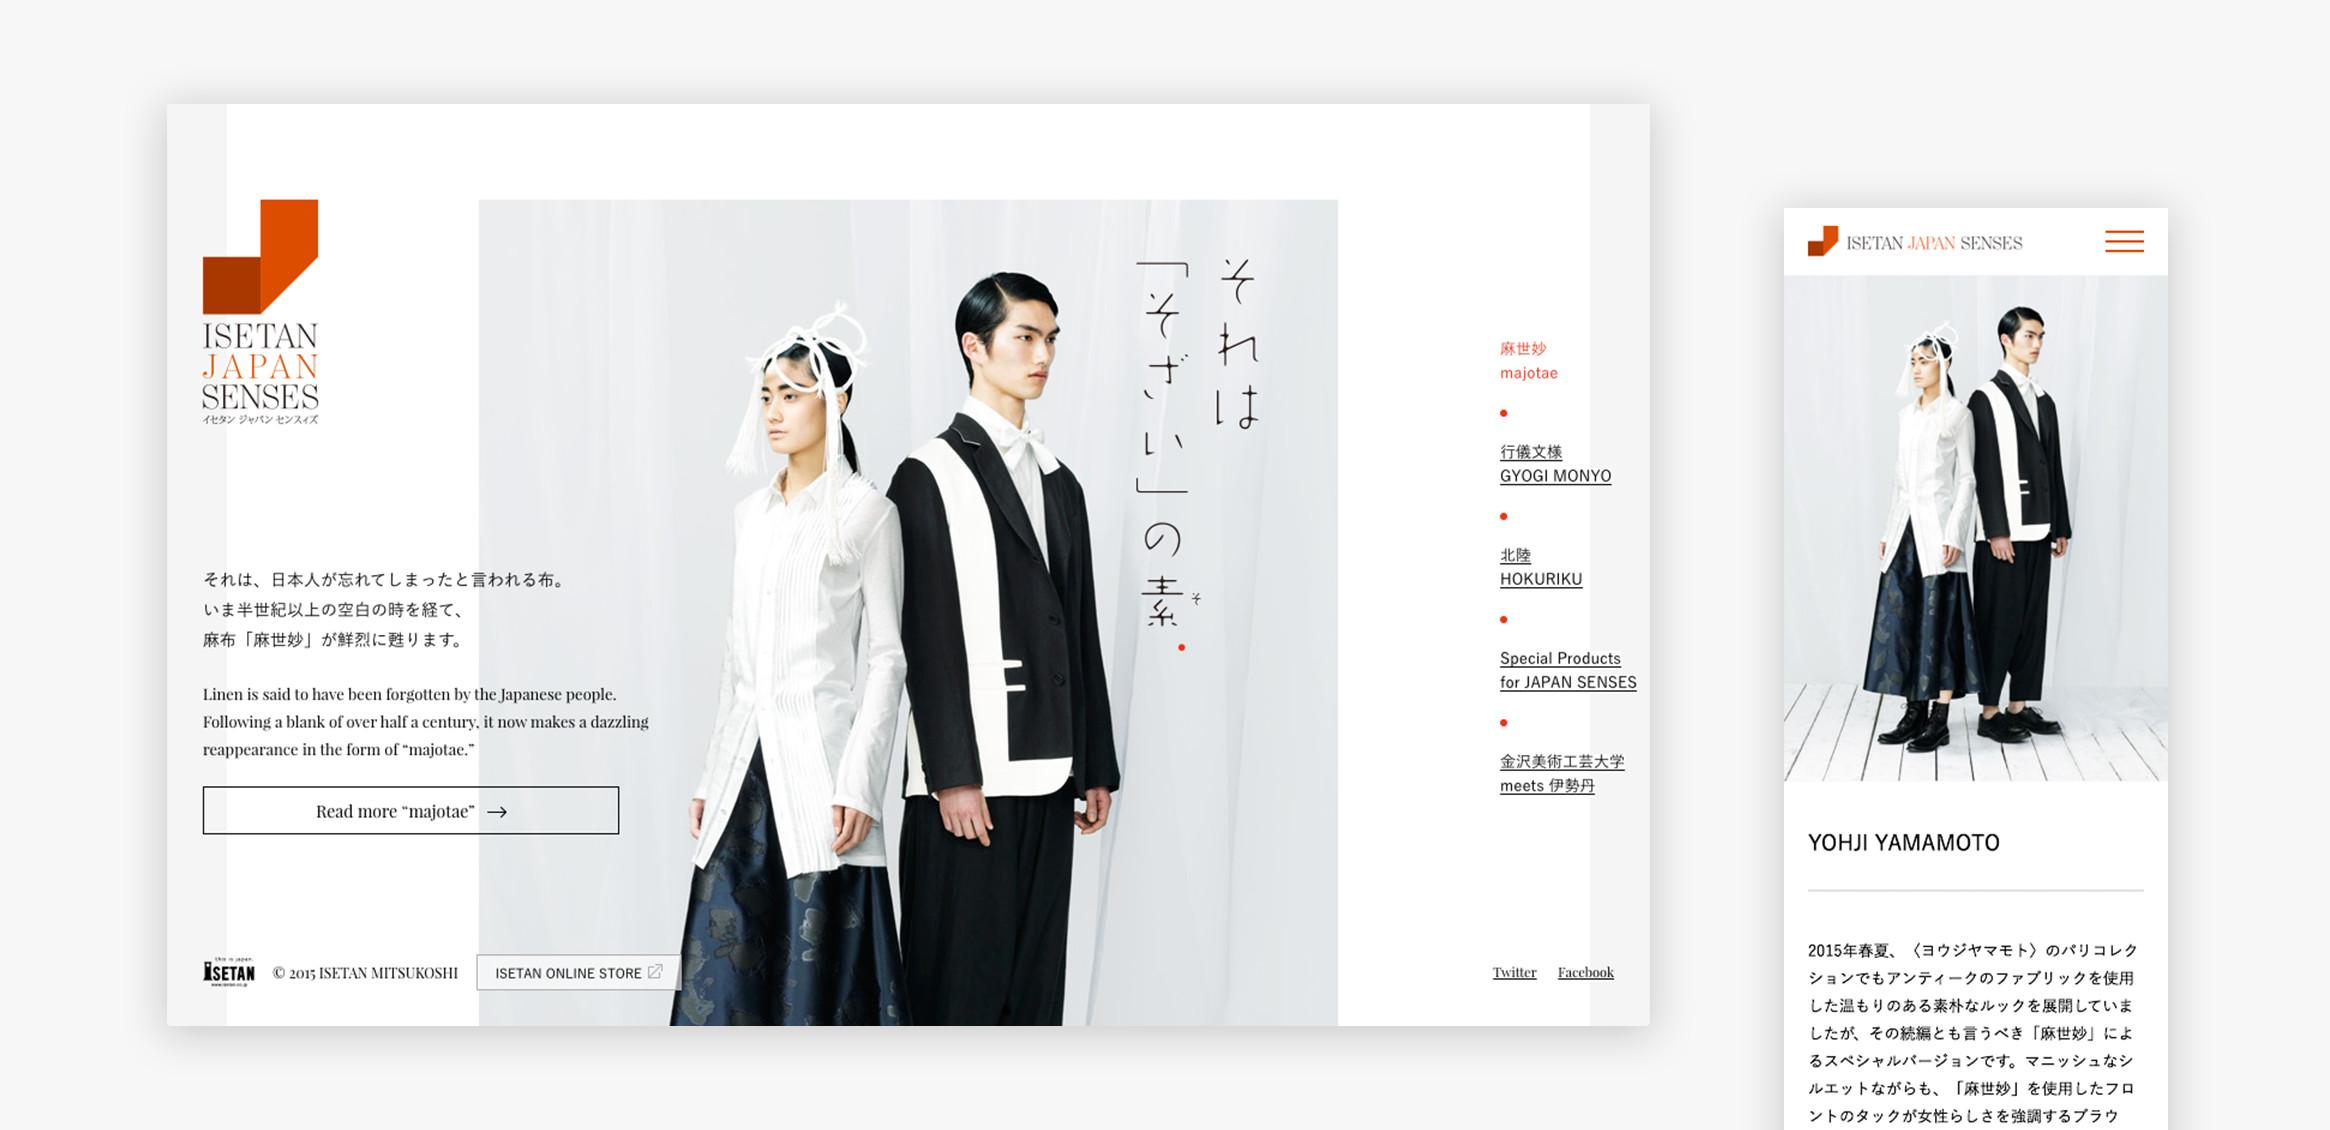 ISETAN JAPAN SENSES 20153枚目